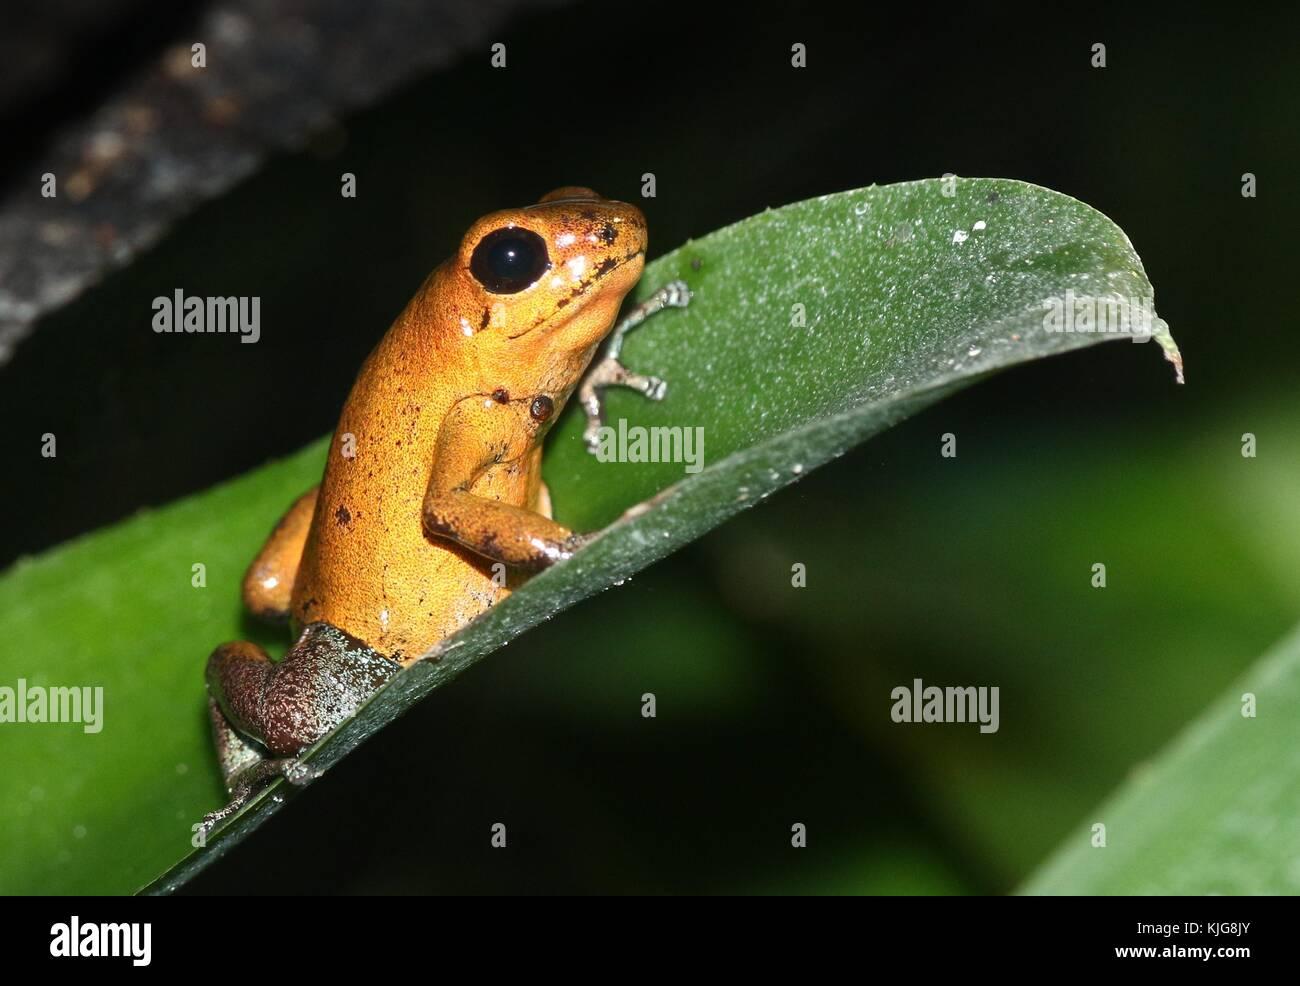 Central American Strawberry poison (dart) frog (Oophaga pumilio, Dendrobates pumilio) - Subspecies Almirante, yellow - Stock Image